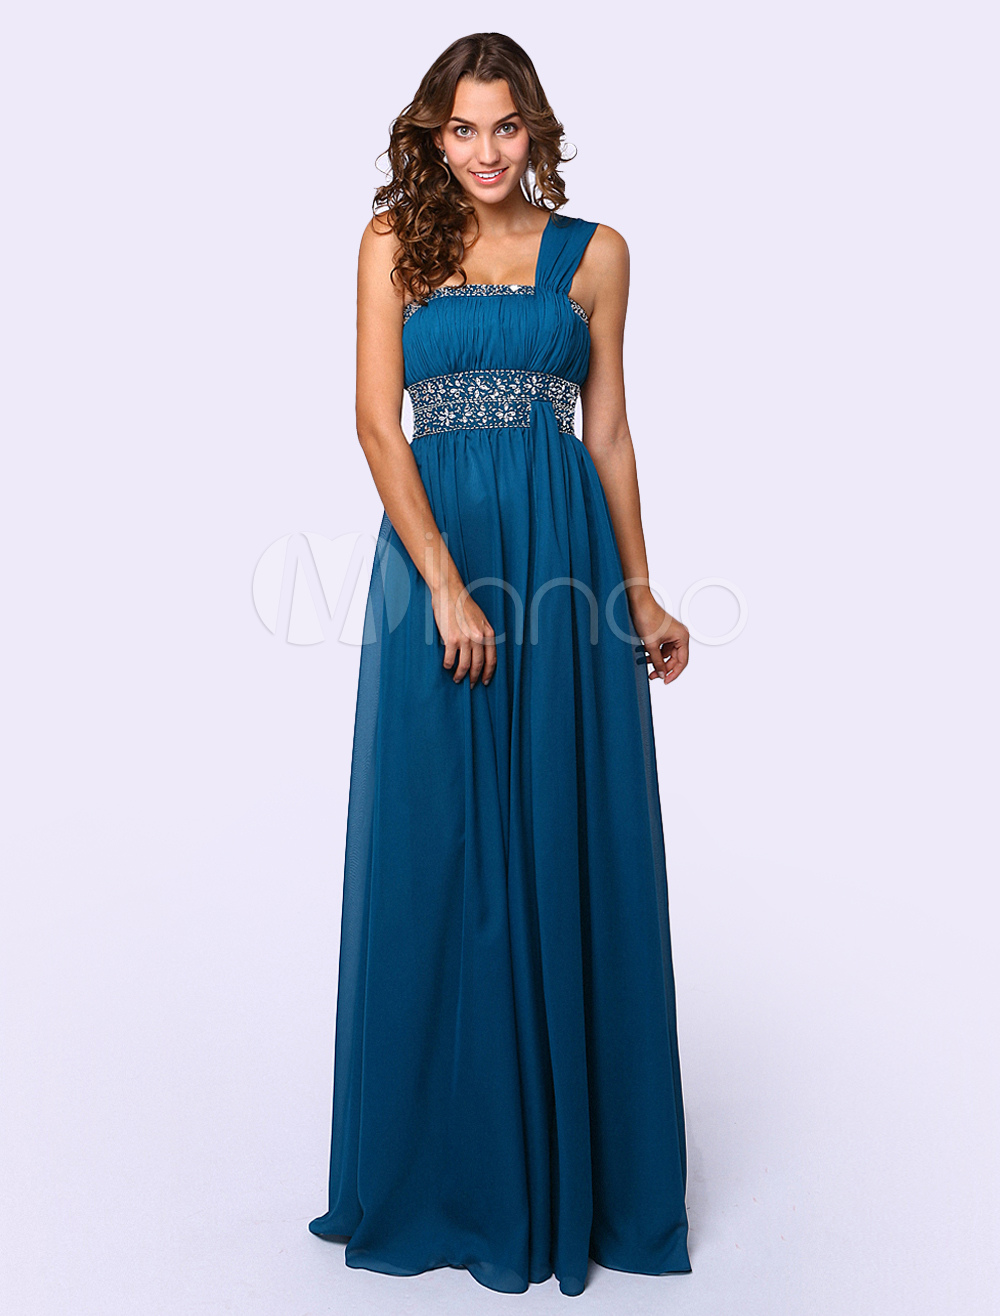 Ocean Blue Chiffon Bohemian One-Shoulder Beaded Prom Dress (Wedding Prom Dresses) photo